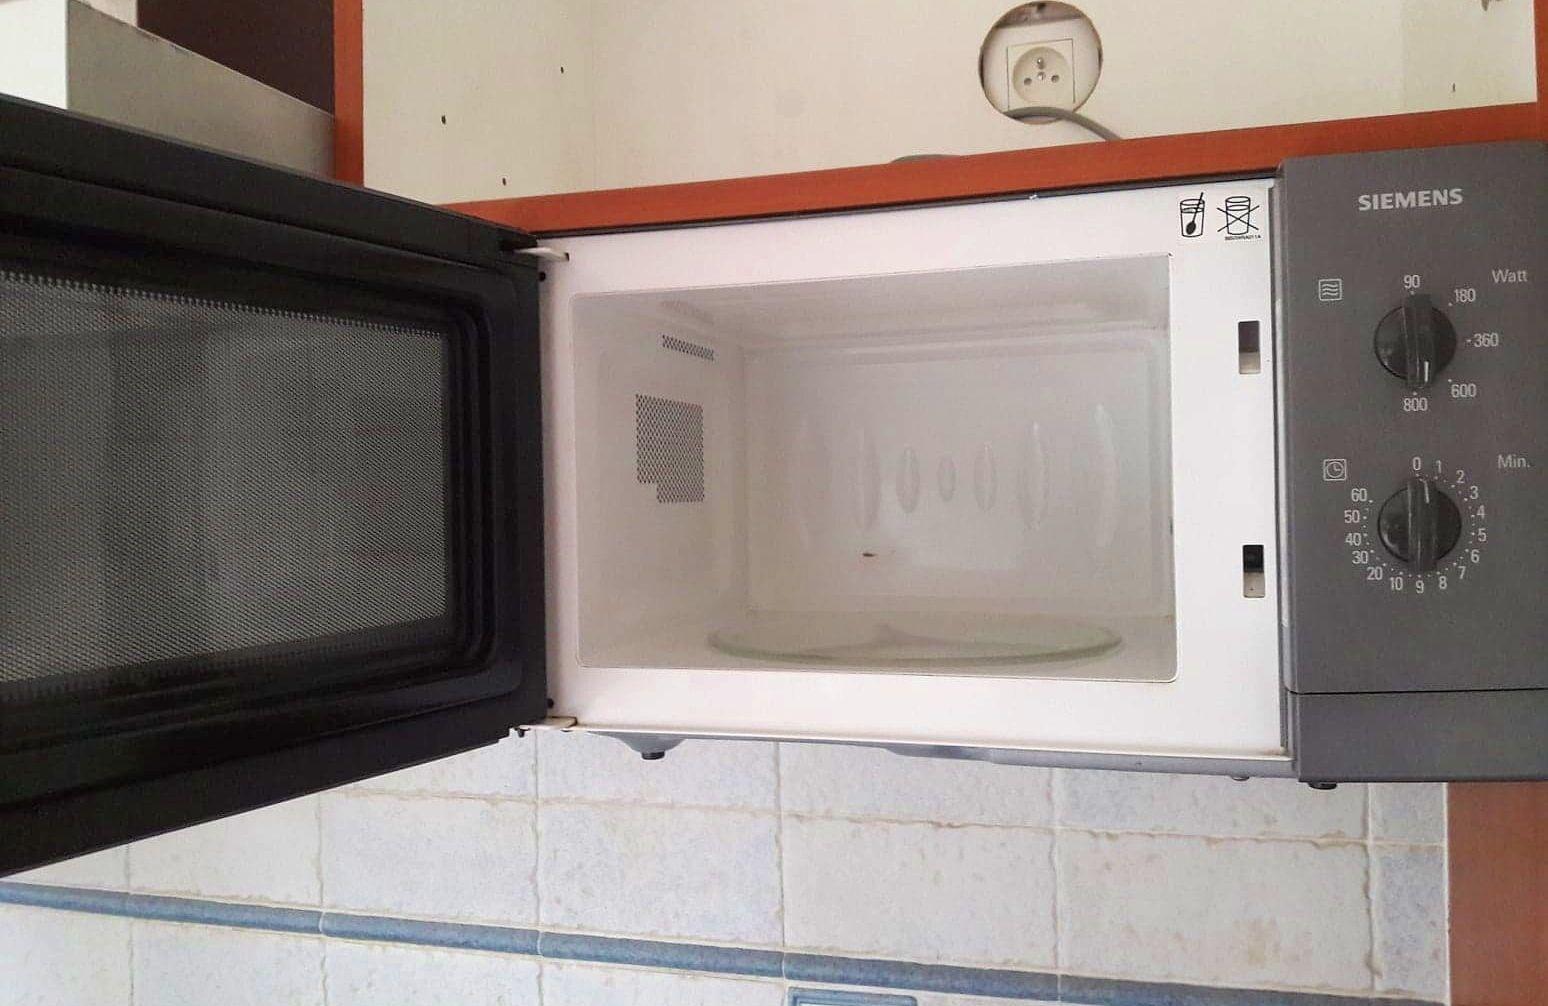 Vends four micro-ondes 19L SIEMENS